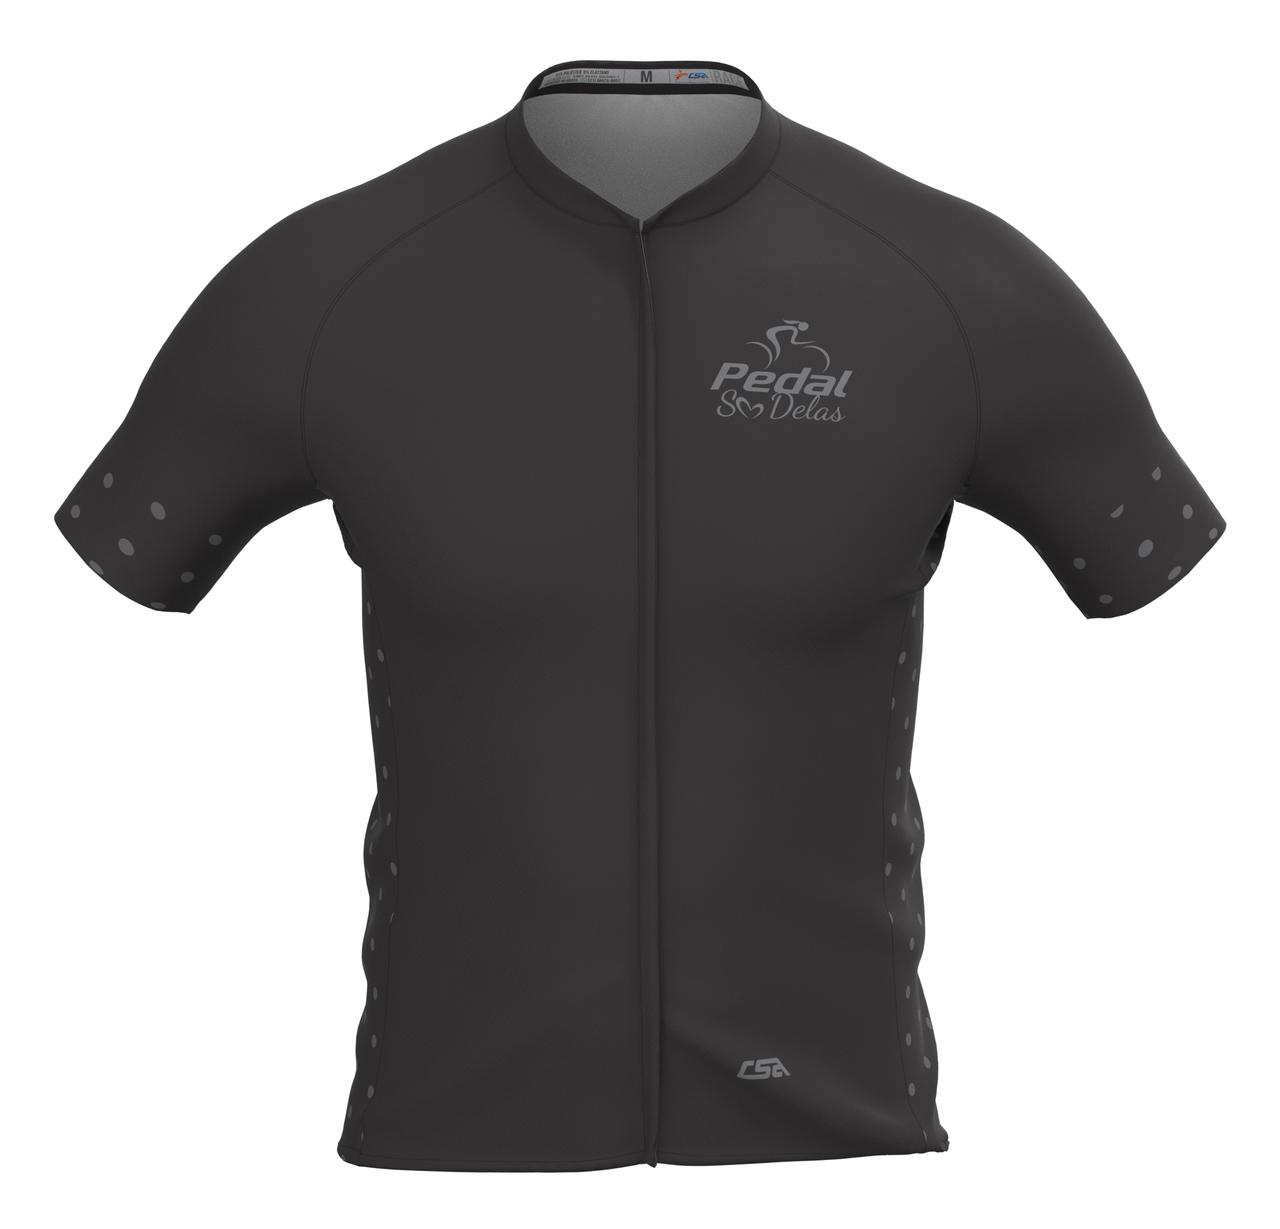 Camisa Ciclista Masculina Race Pedal Só Delas All Black